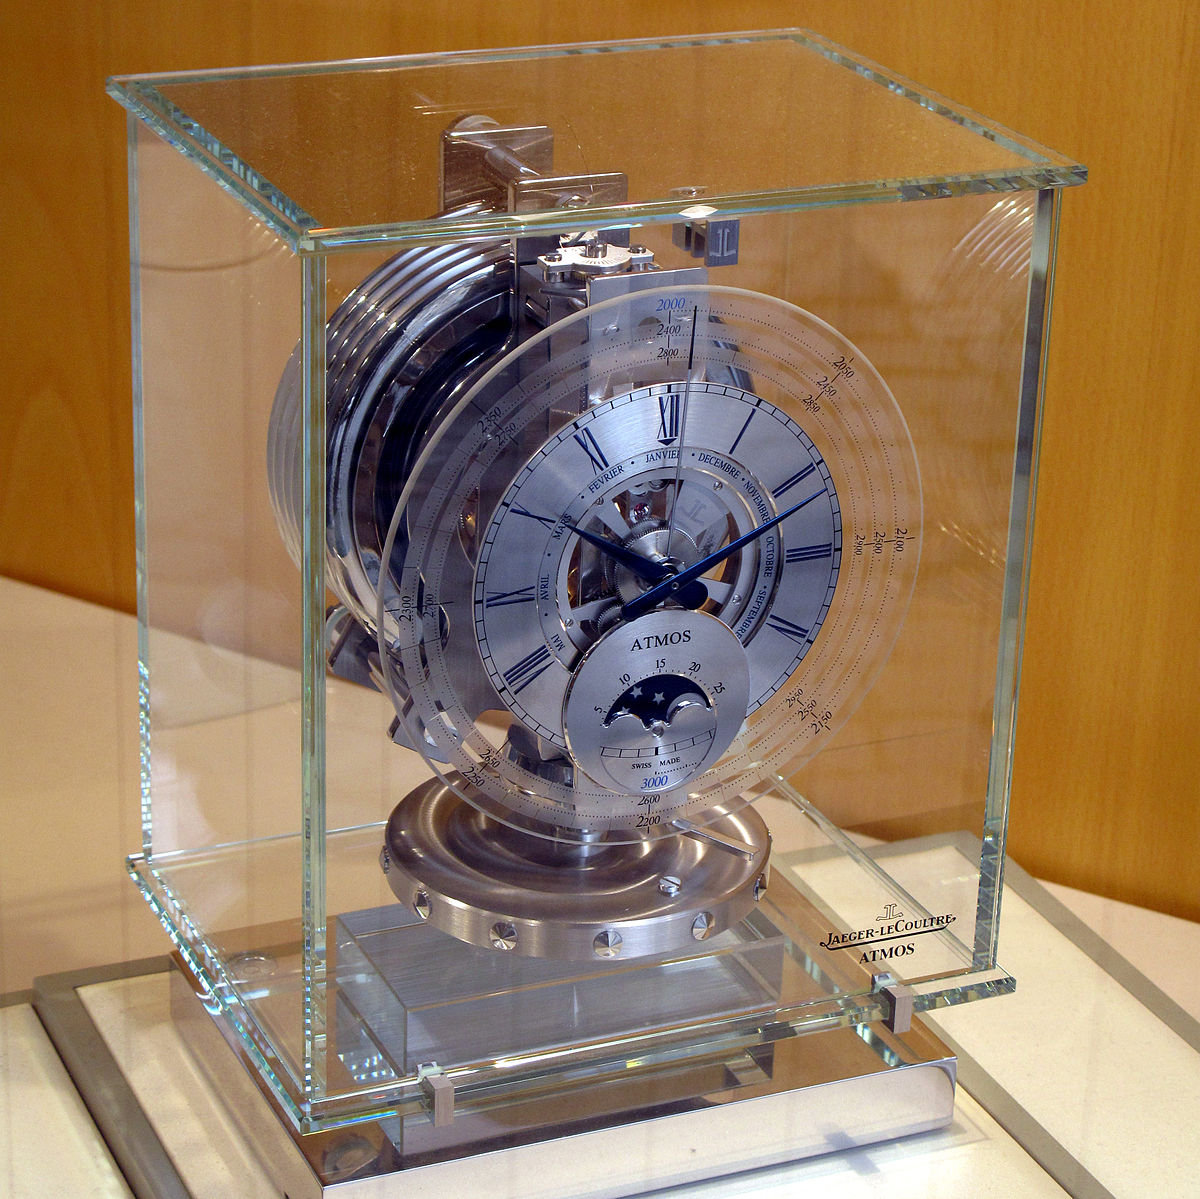 Atmos Clock Wikipedia